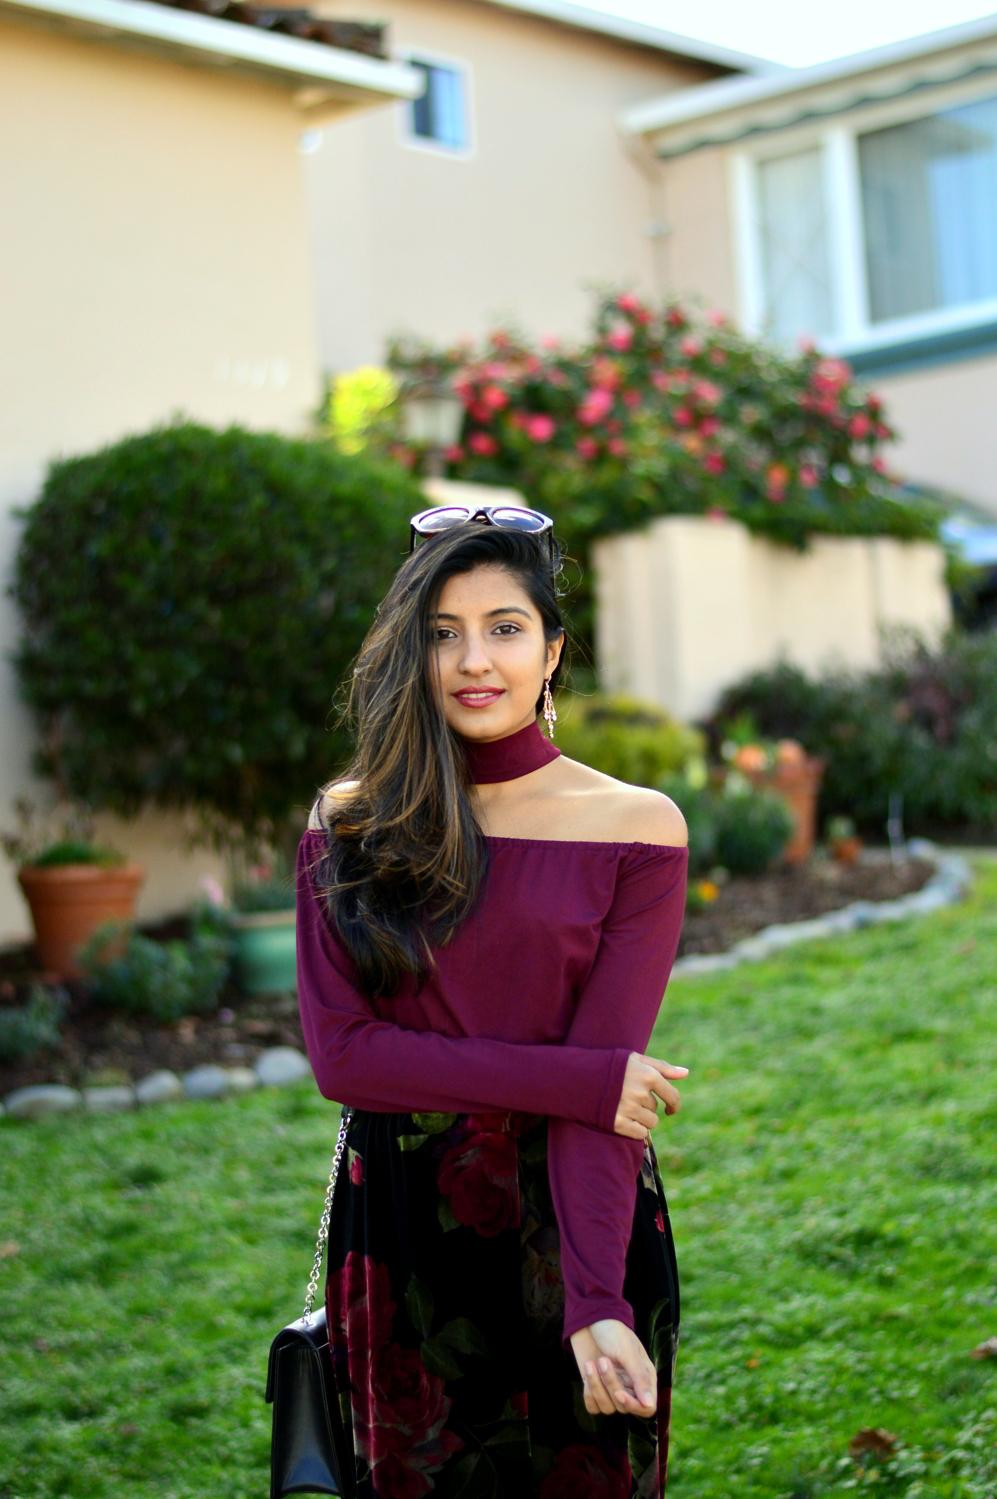 velvet-floral-skirt-choker-burgundy-top-party-outfit-NYE-blogger 2